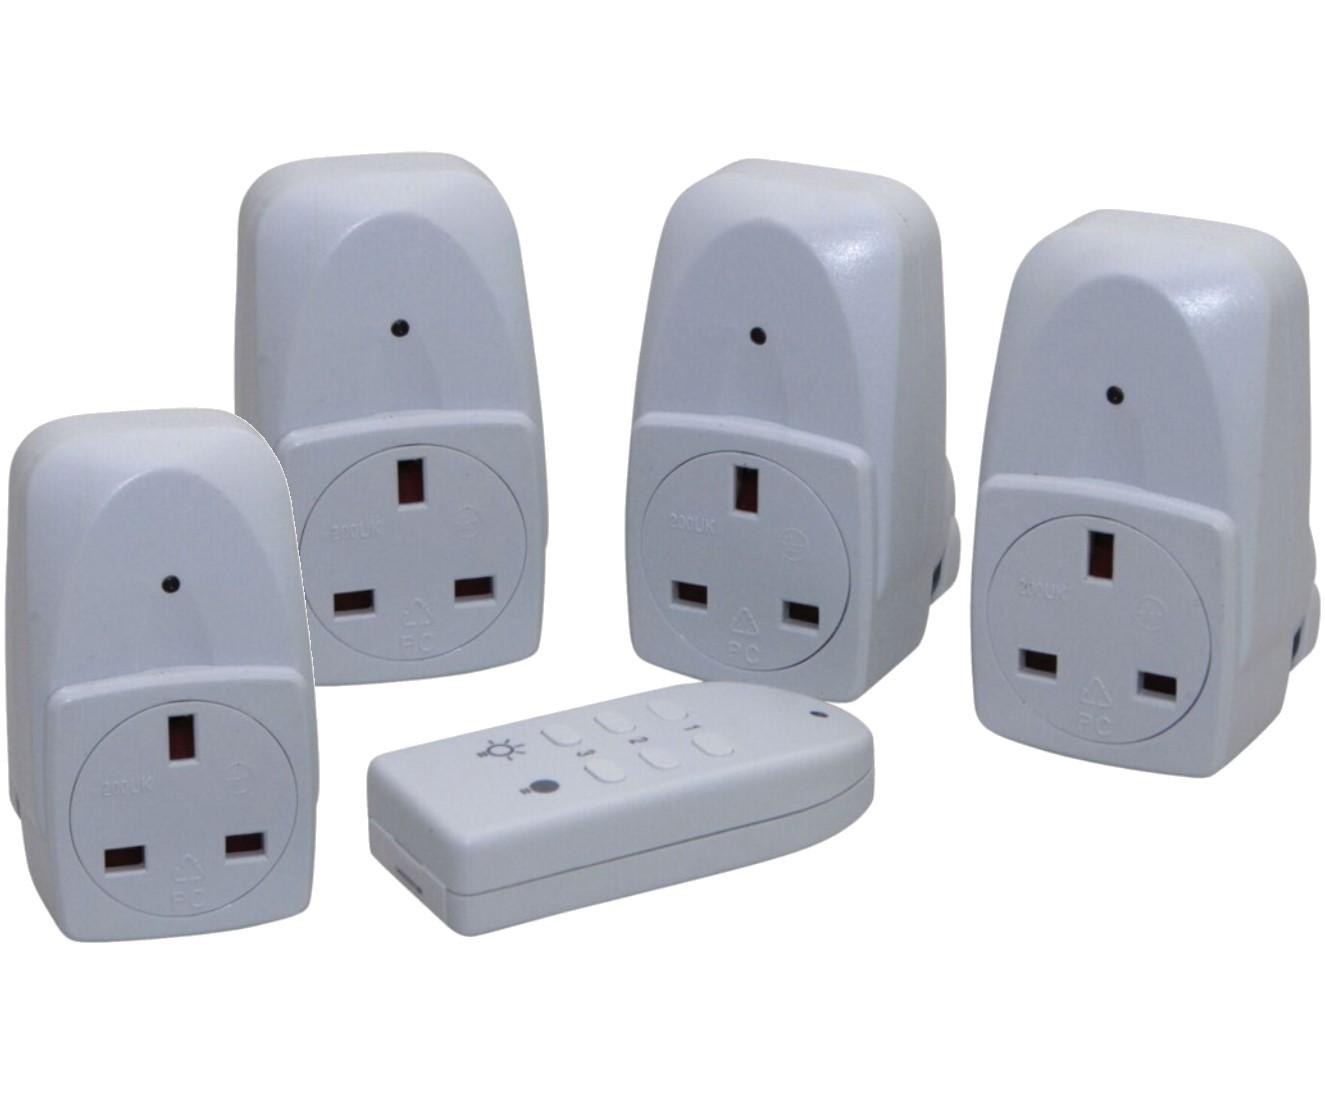 wireless remote control electrical sockets 2 pack uk plug. Black Bedroom Furniture Sets. Home Design Ideas